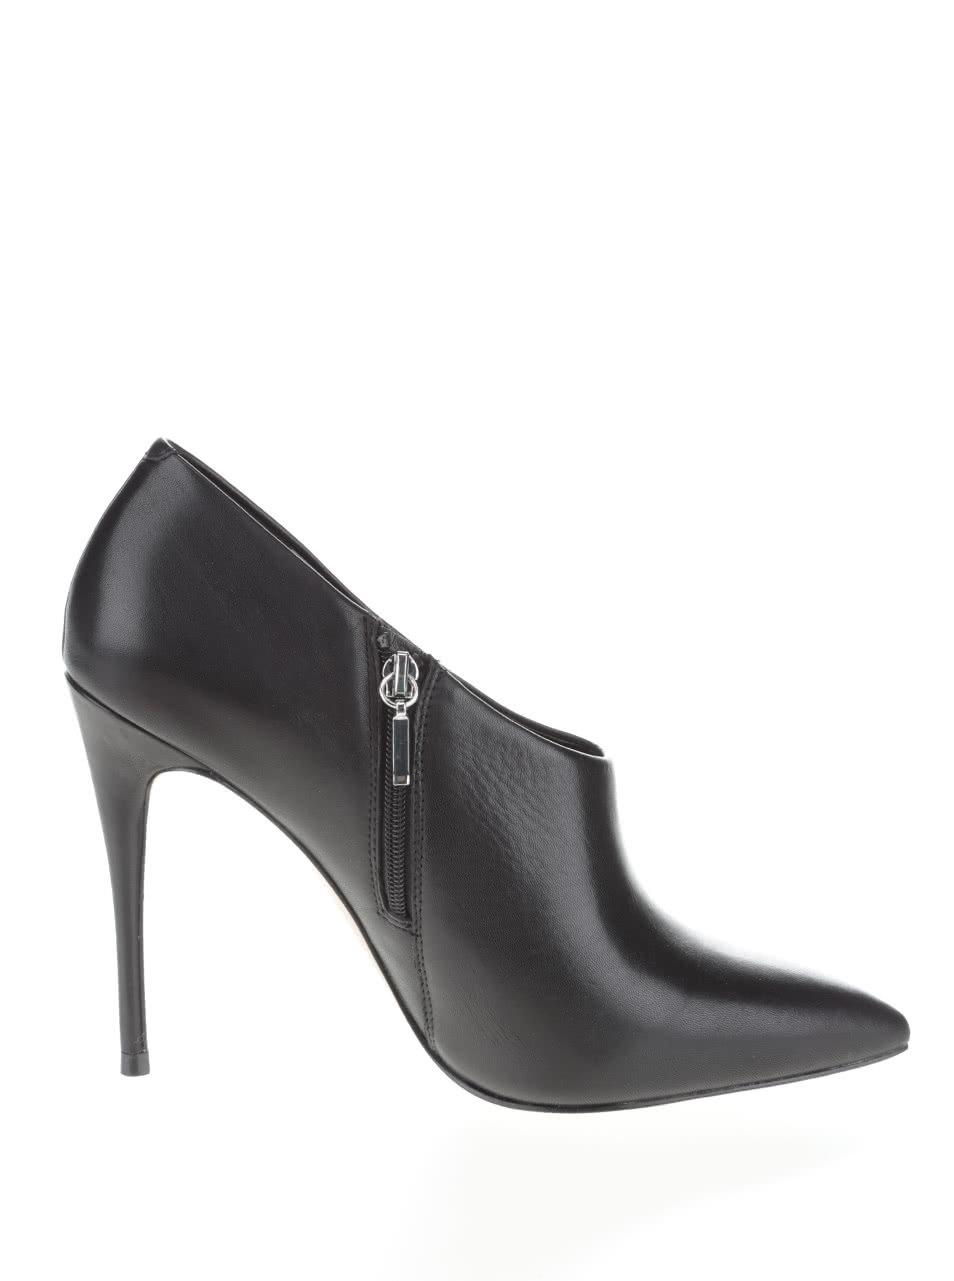 f743130da22c Čierne topánky na ihličkovom podpätku ALDO Capestick ...